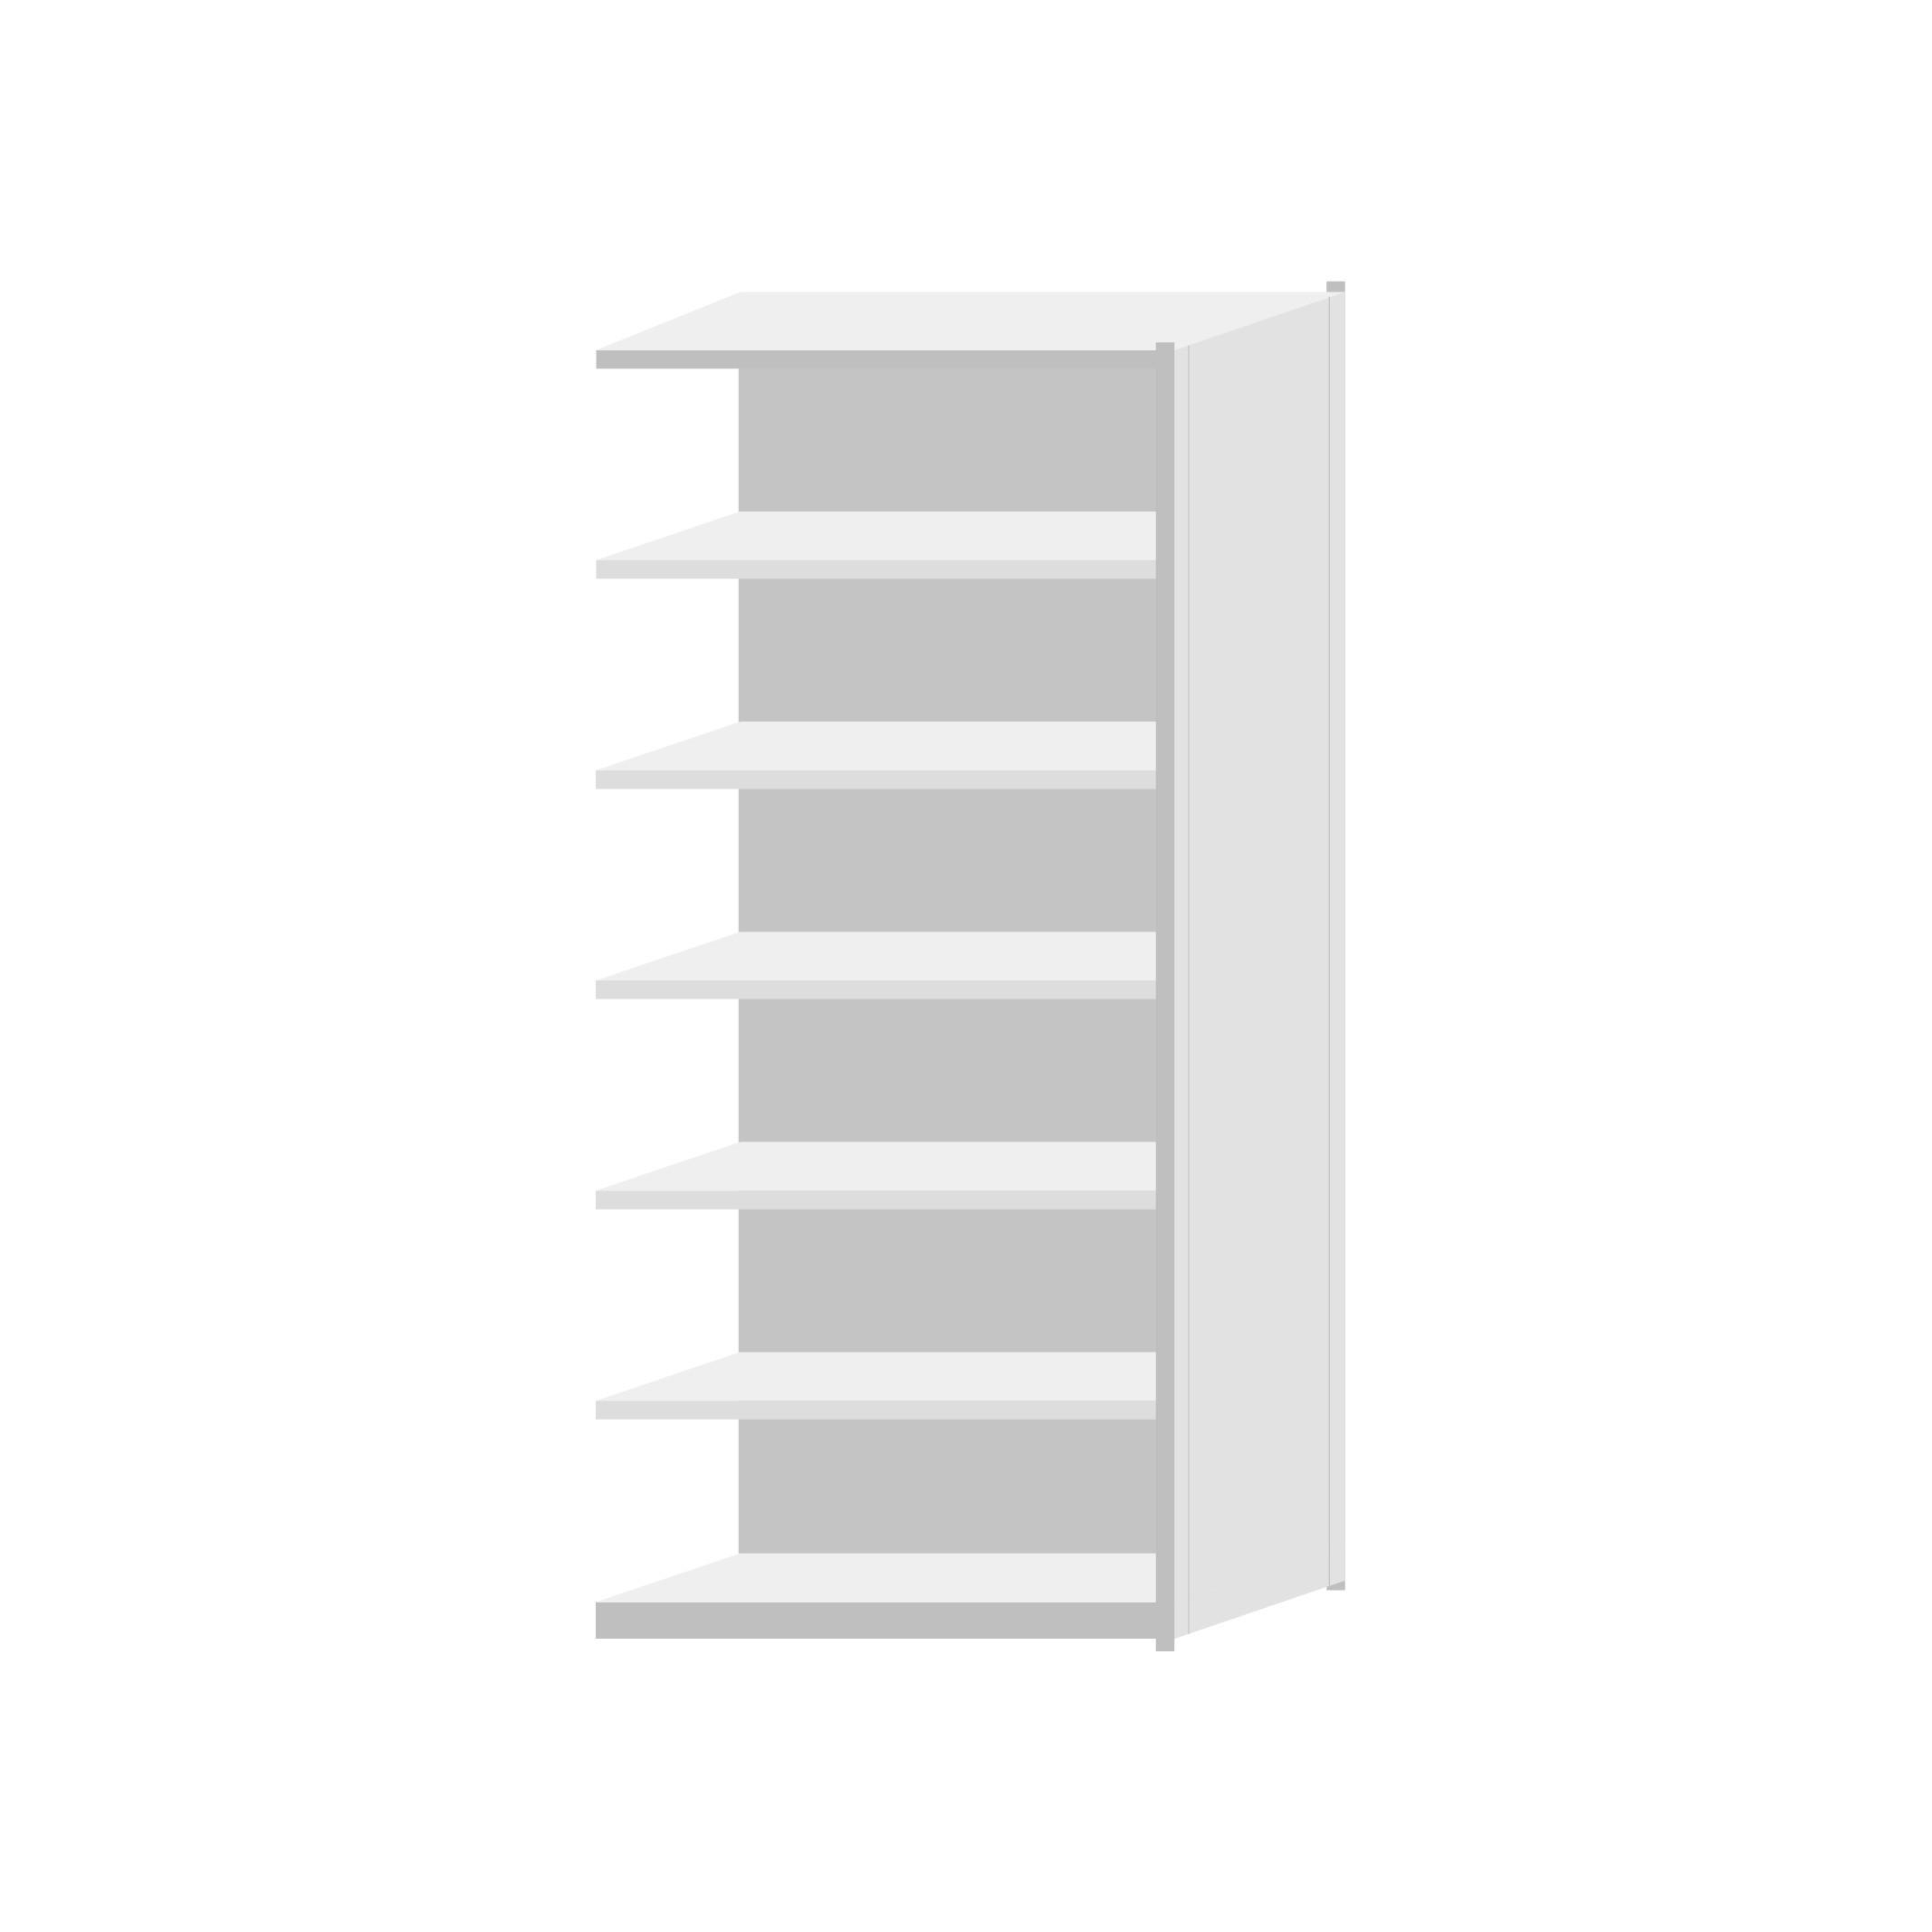 RUT Add-On Bay 900mm Wide - 7 Levels (Single Sided)